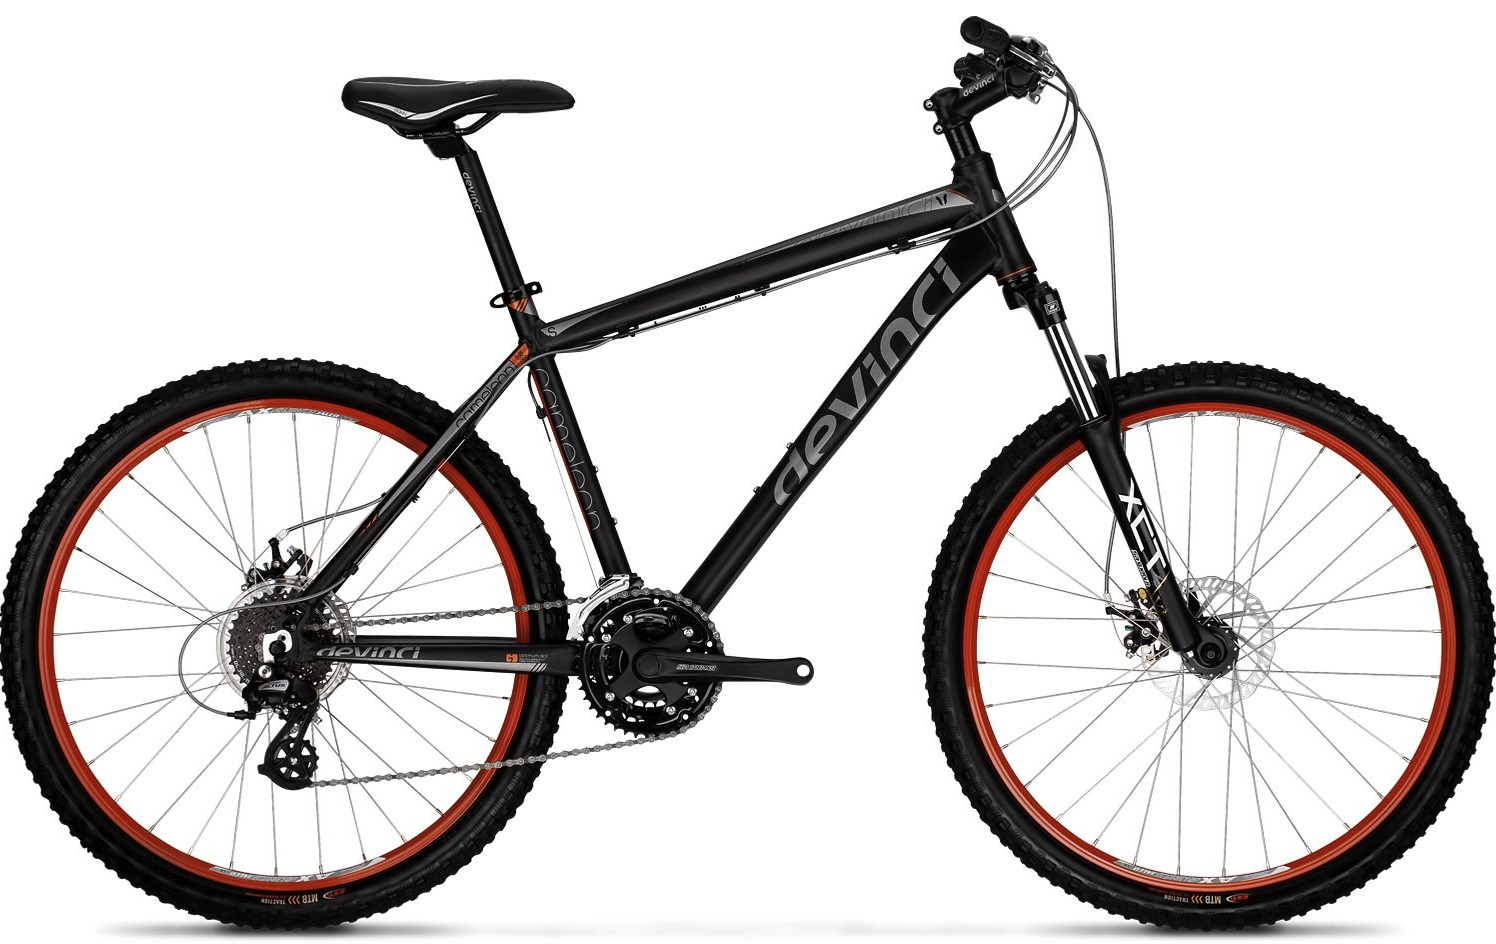 2013 Devinci Cameleon S Bike 2013 Devinci Cameleon S (black)